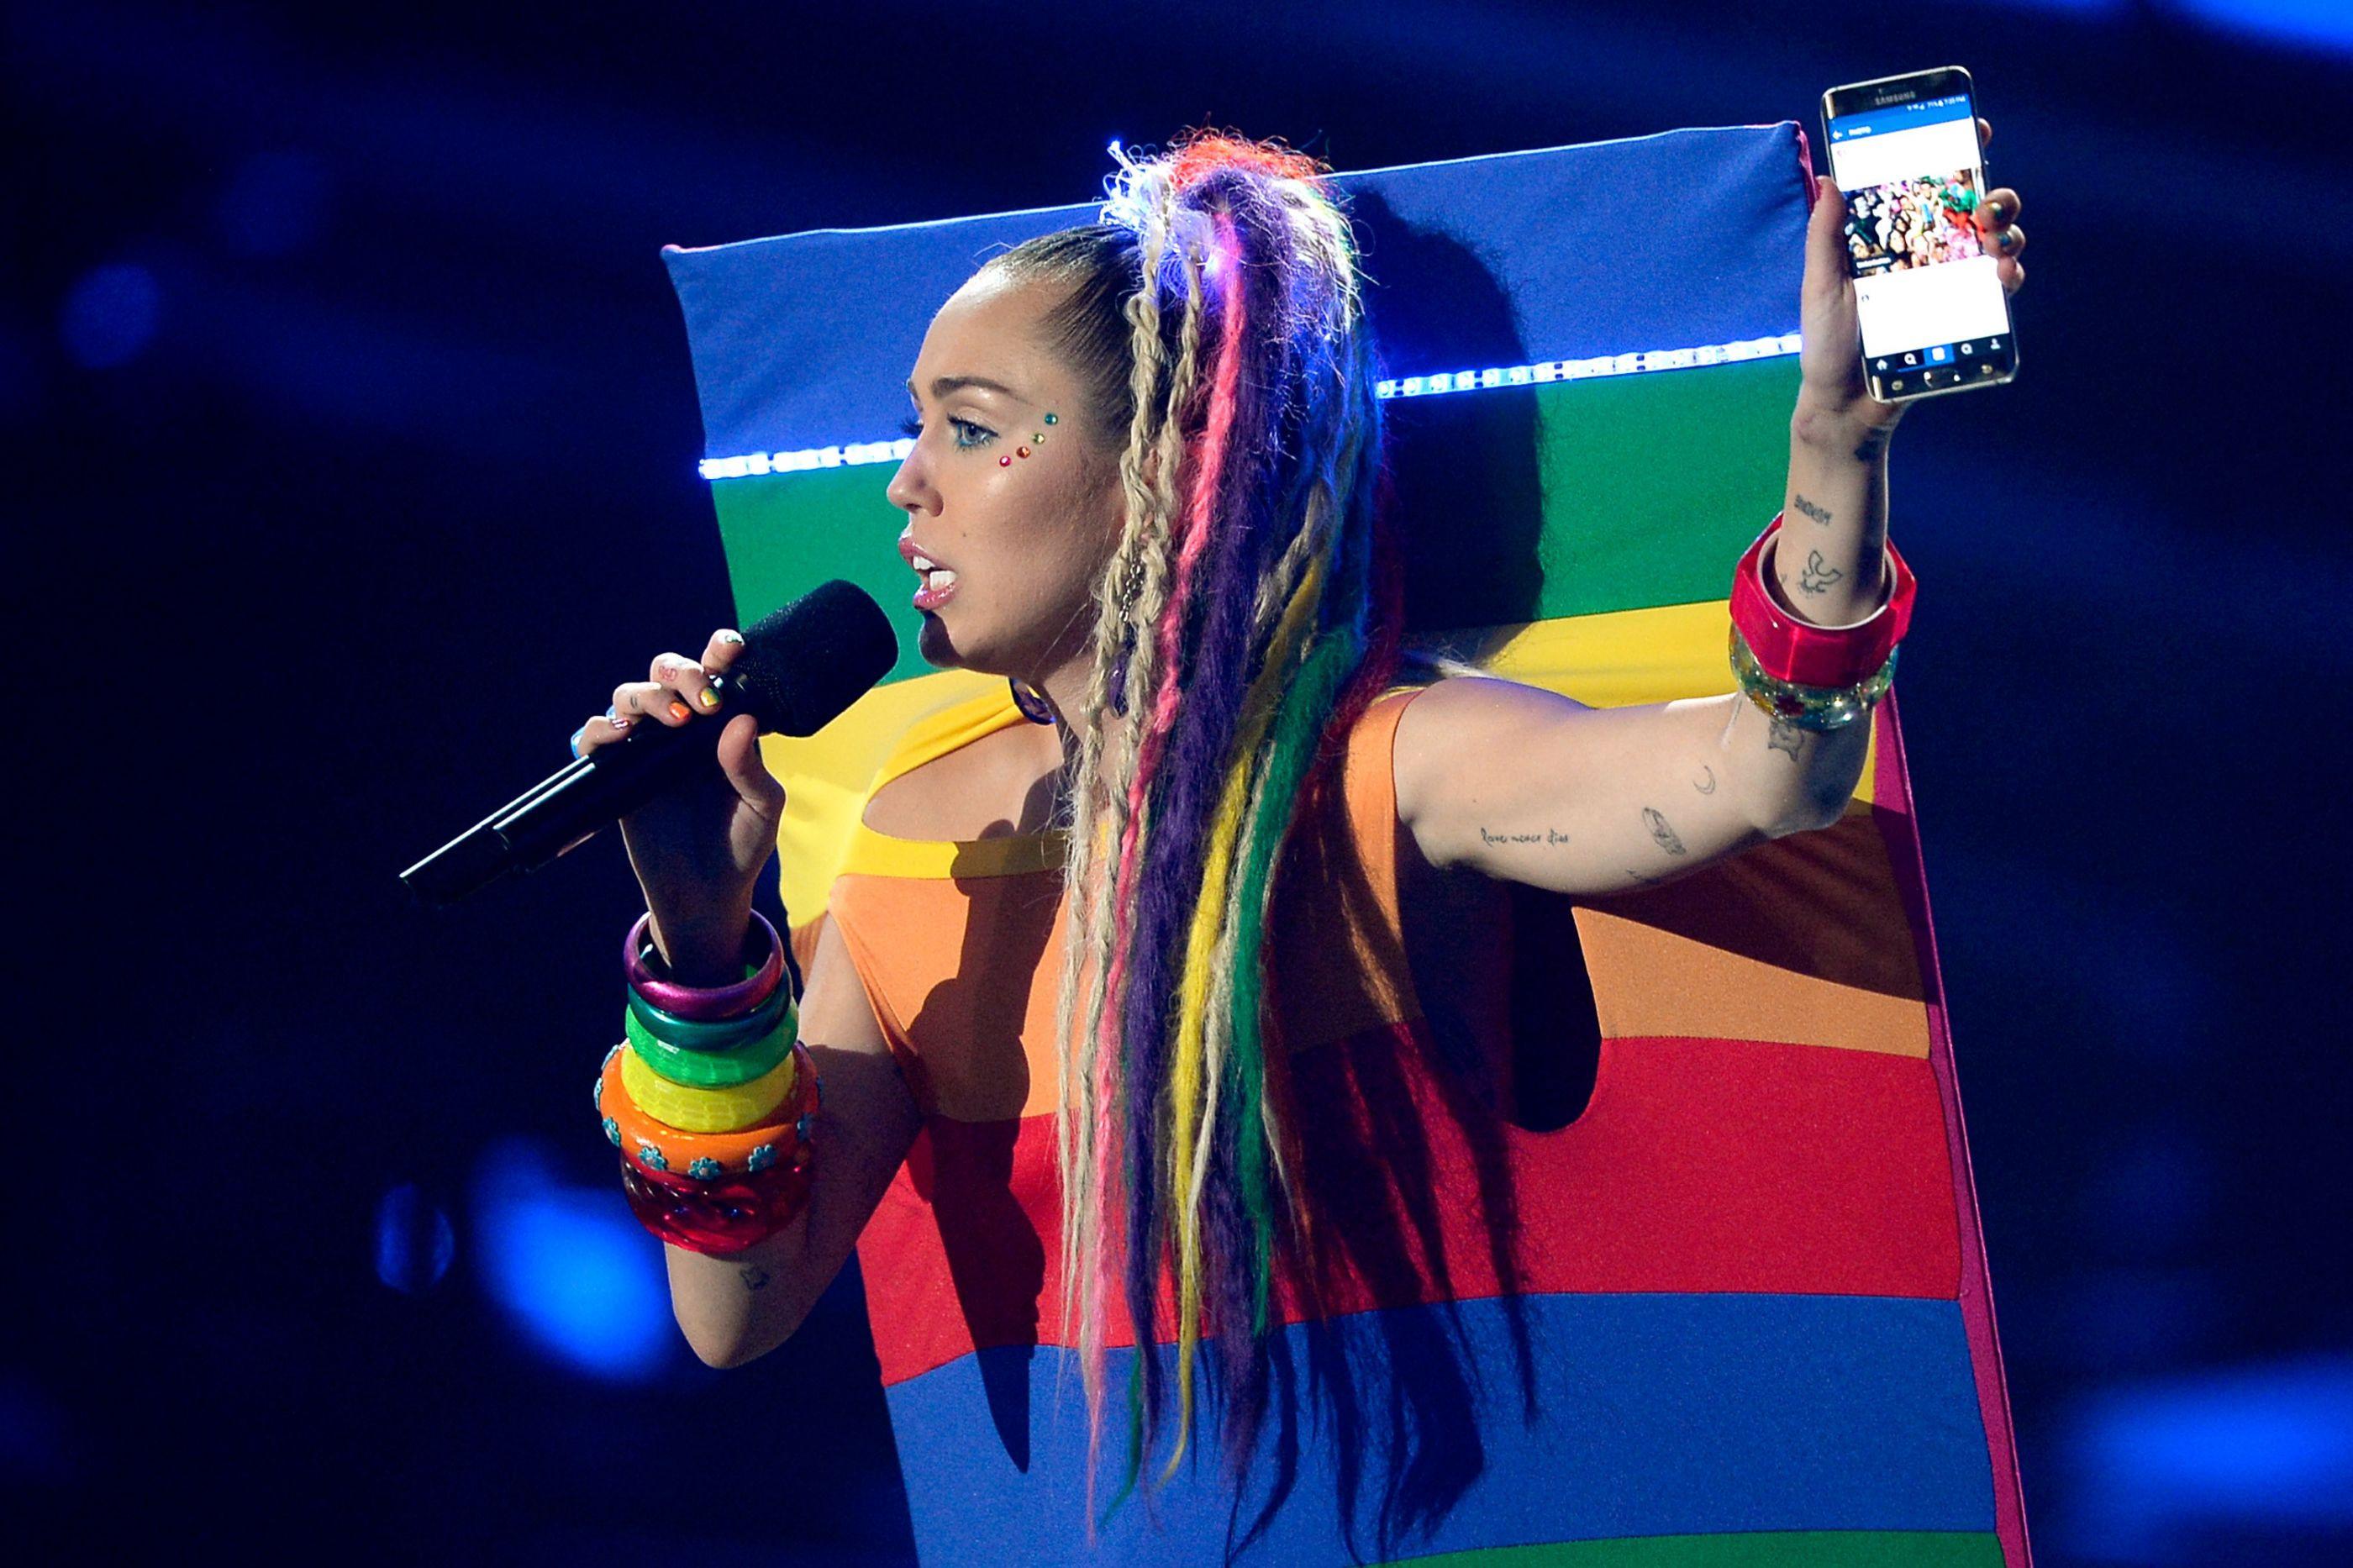 Nova temporada de 'Black Mirror' terá a presença de Miley Cyrus